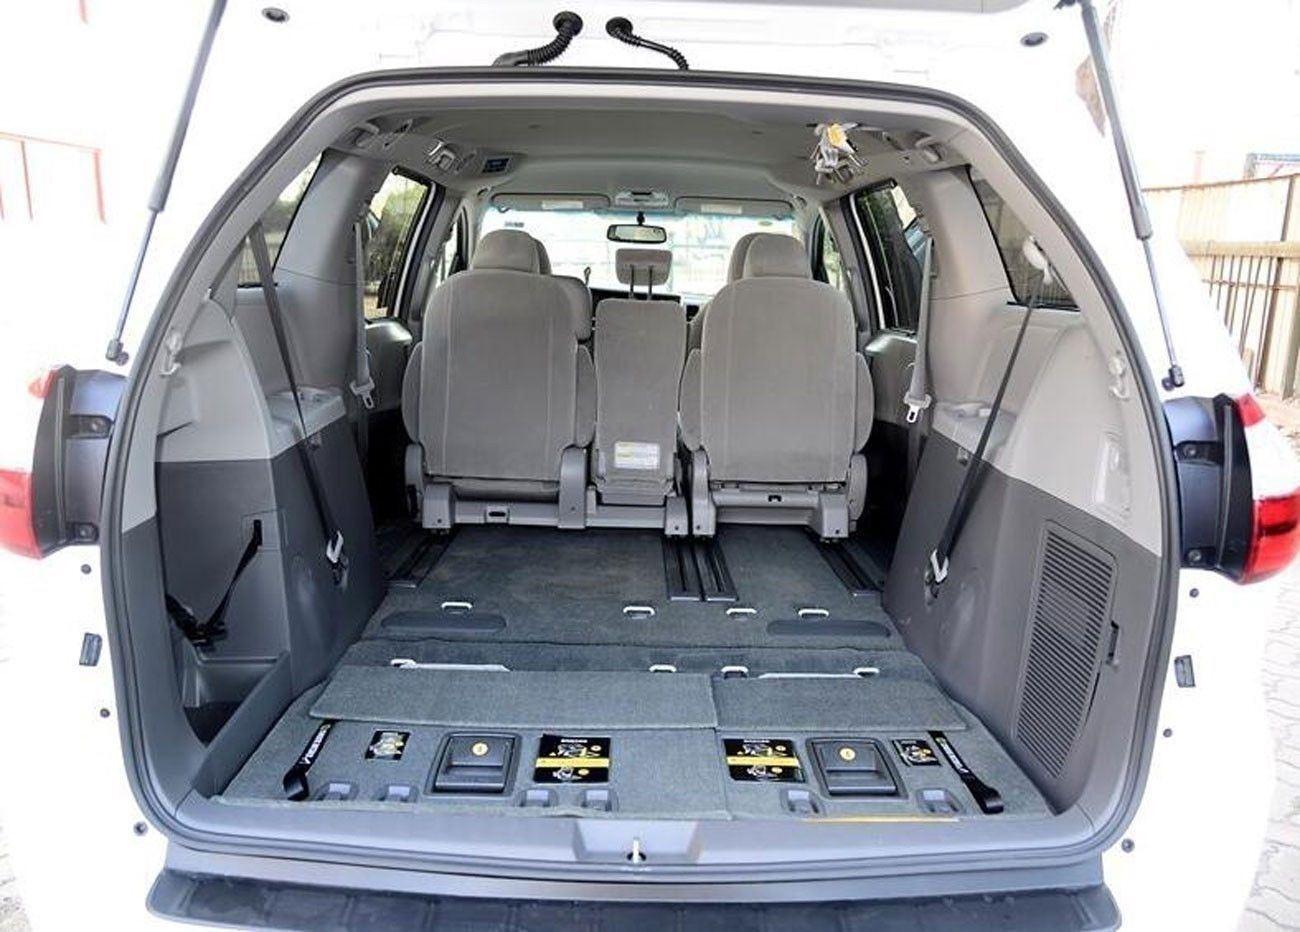 Cargo Net Envelope Style Trunk Storage Organizer Net for Honda Pilot 2016 2017 2018